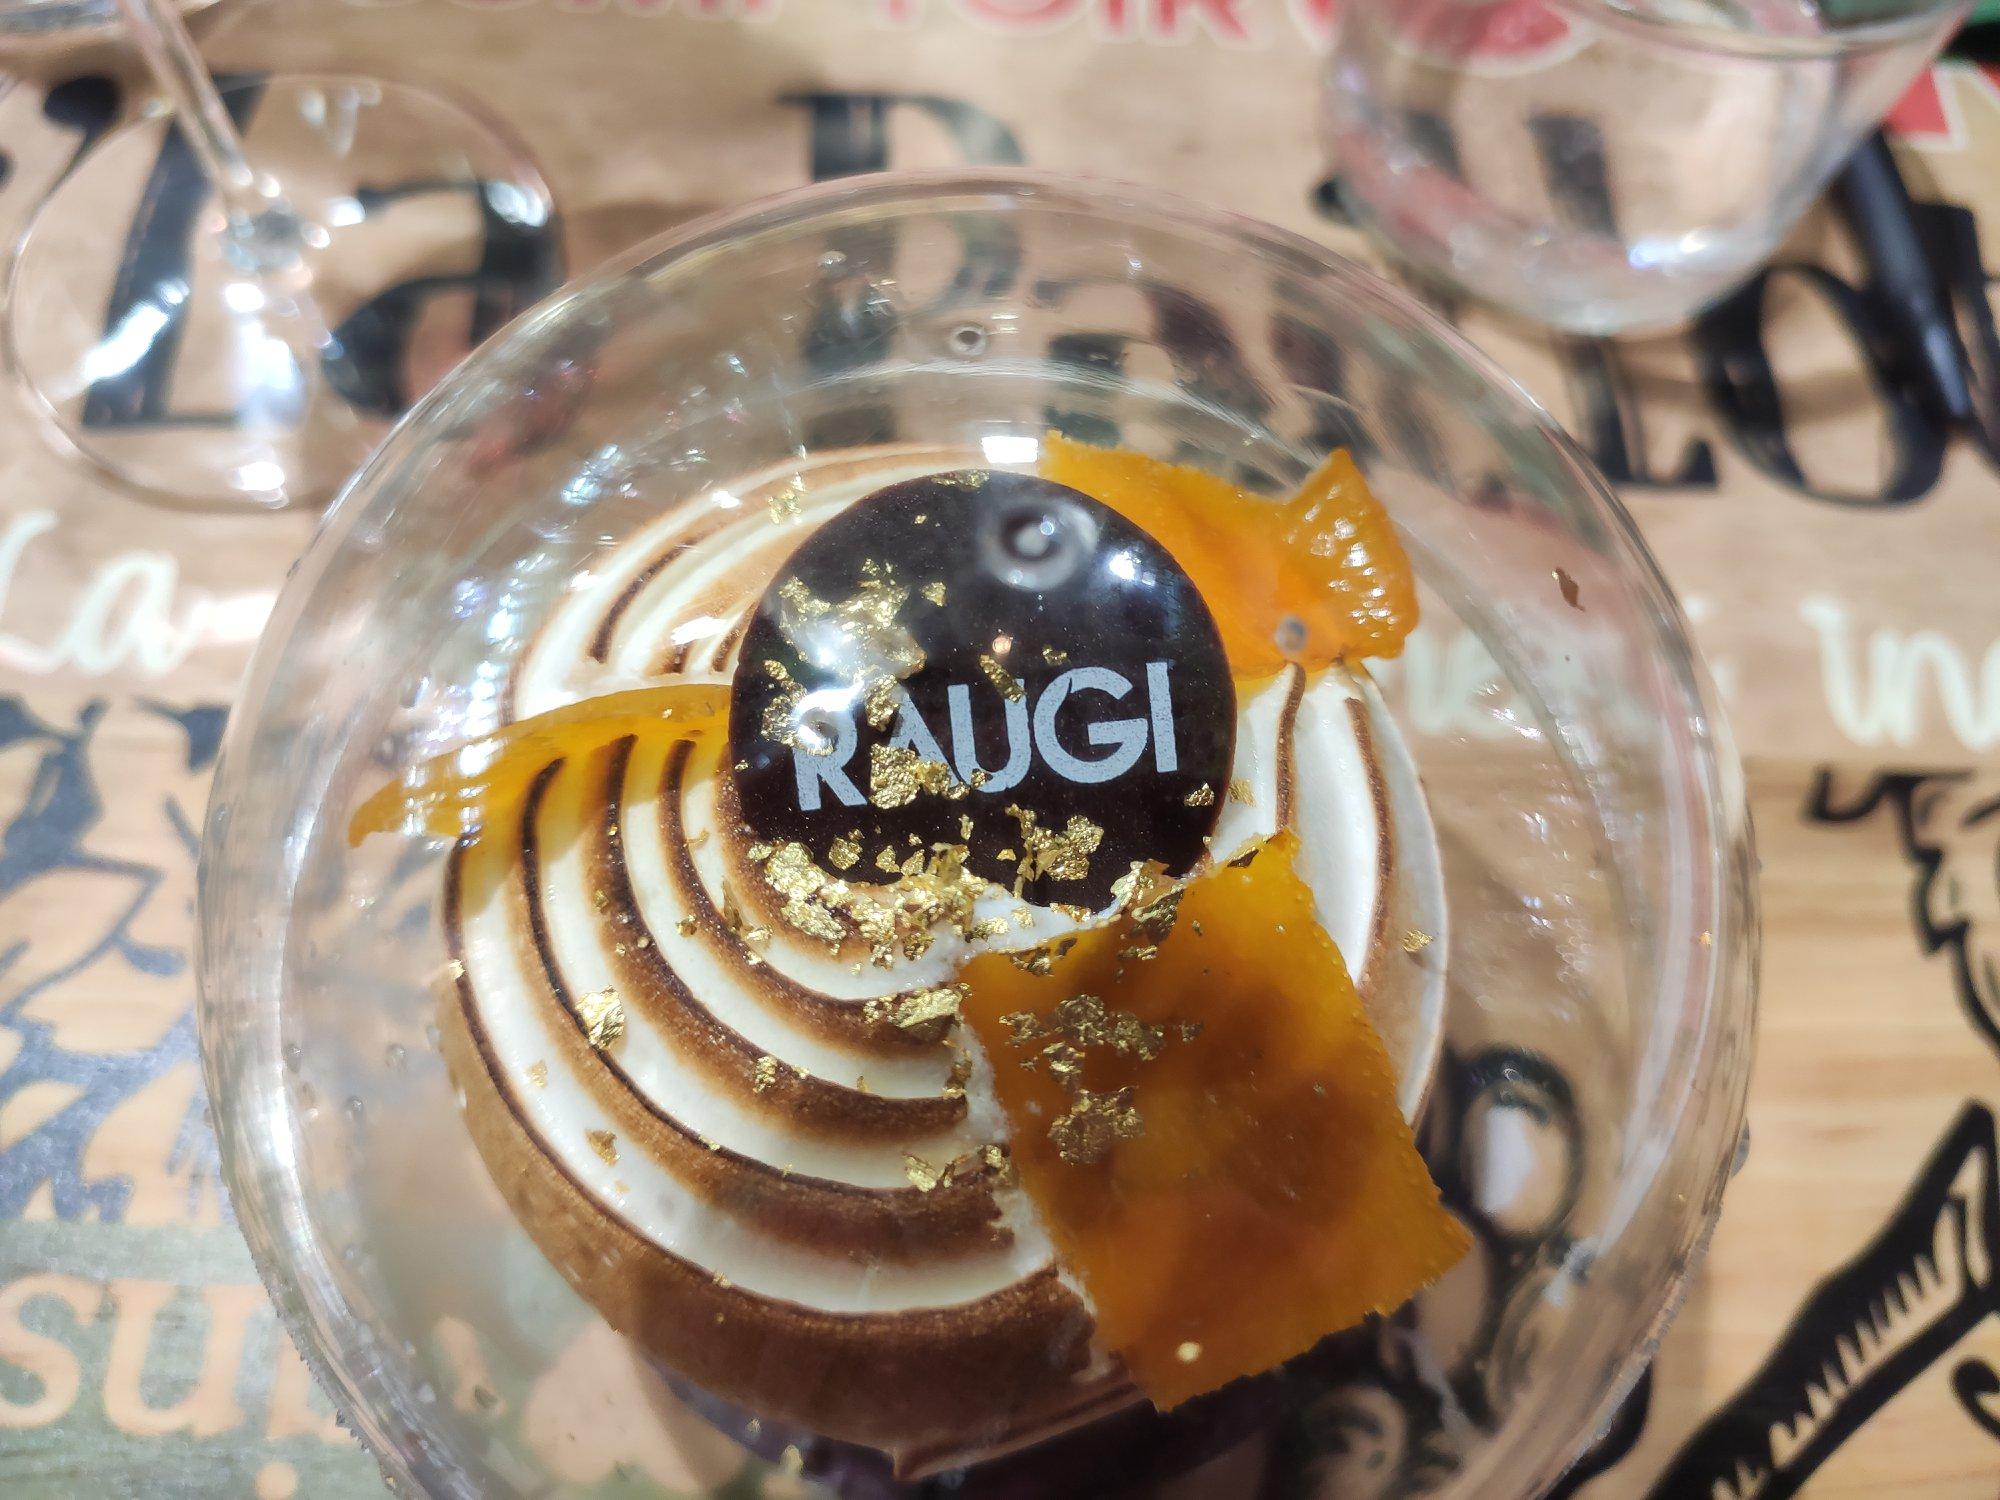 Boule glacée Raugi (Bastia) - Vins de Corse